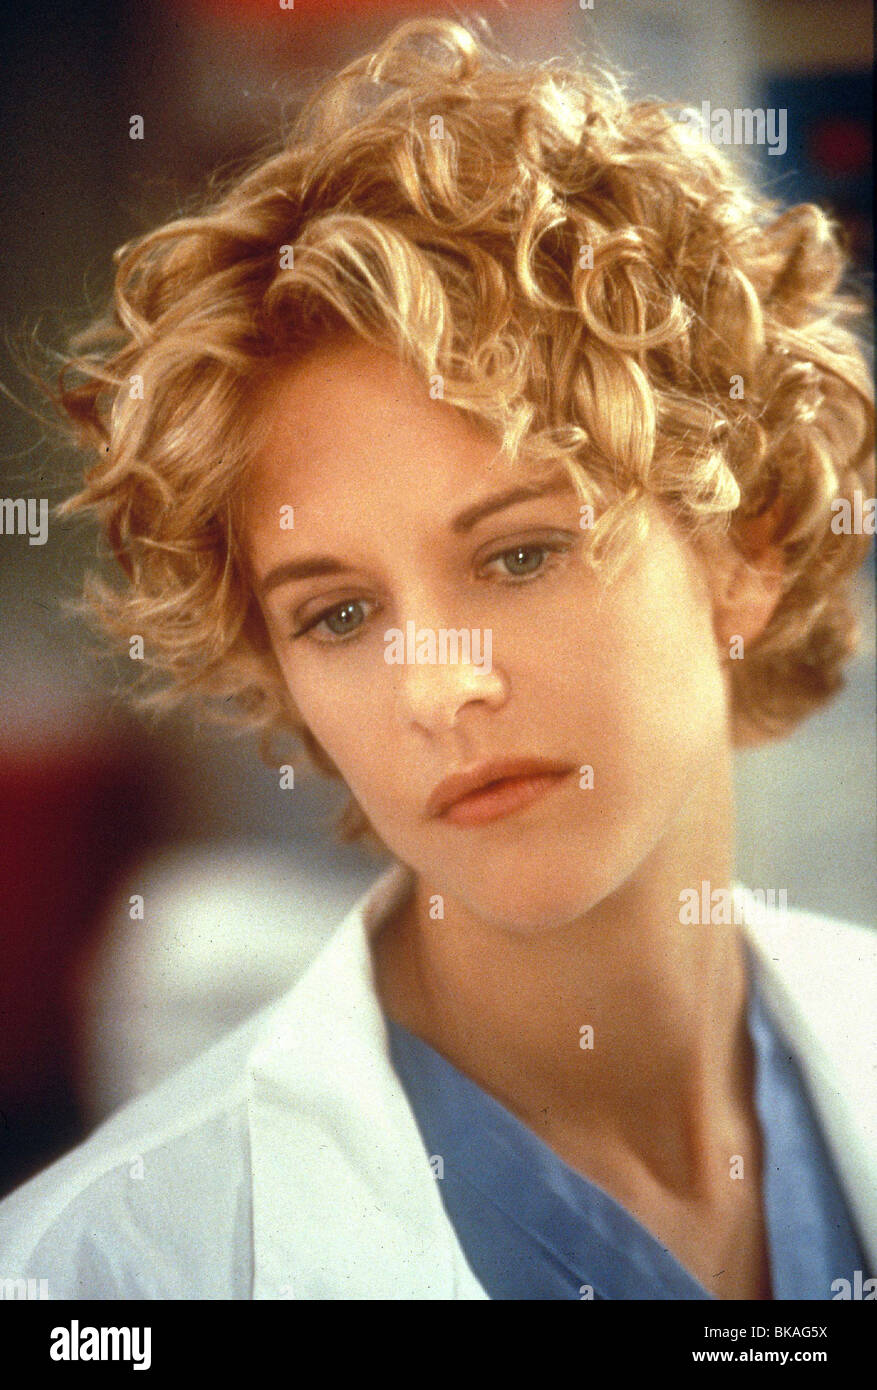 City Of Angels 1998 Meg Ryan Stock Photo Alamy